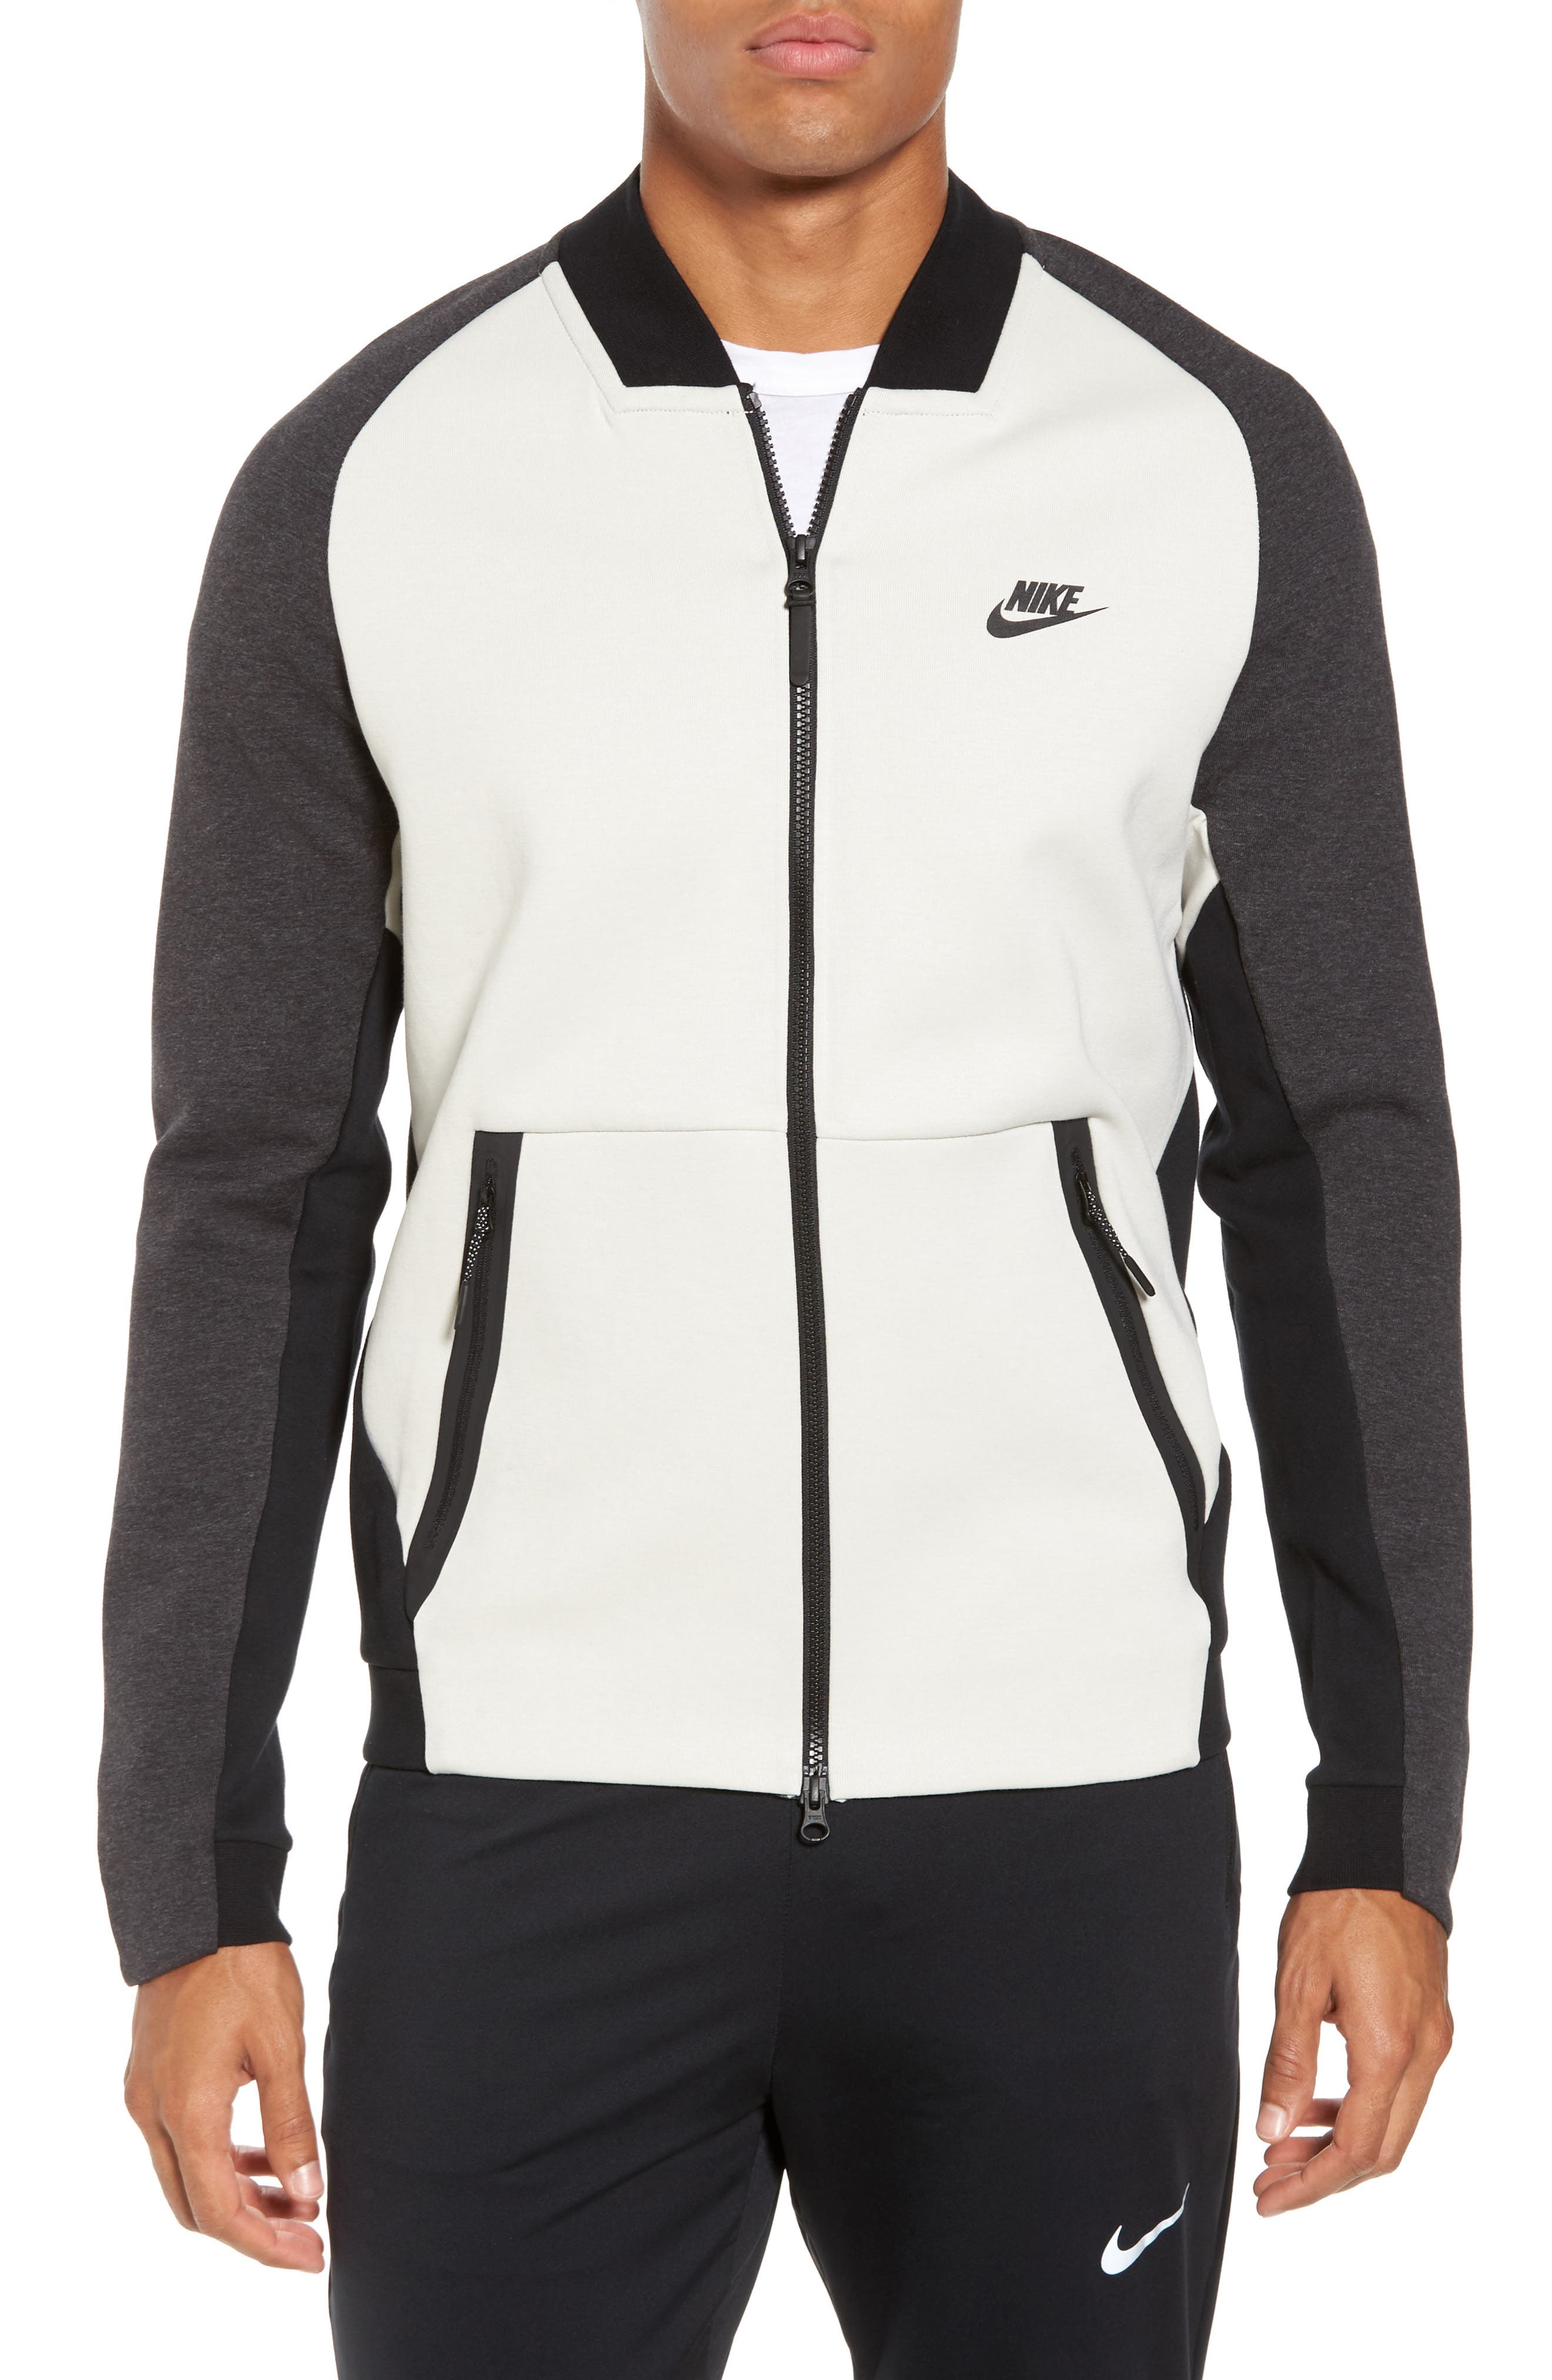 Main Image - Nike Tech Fleece Varsity Jacket